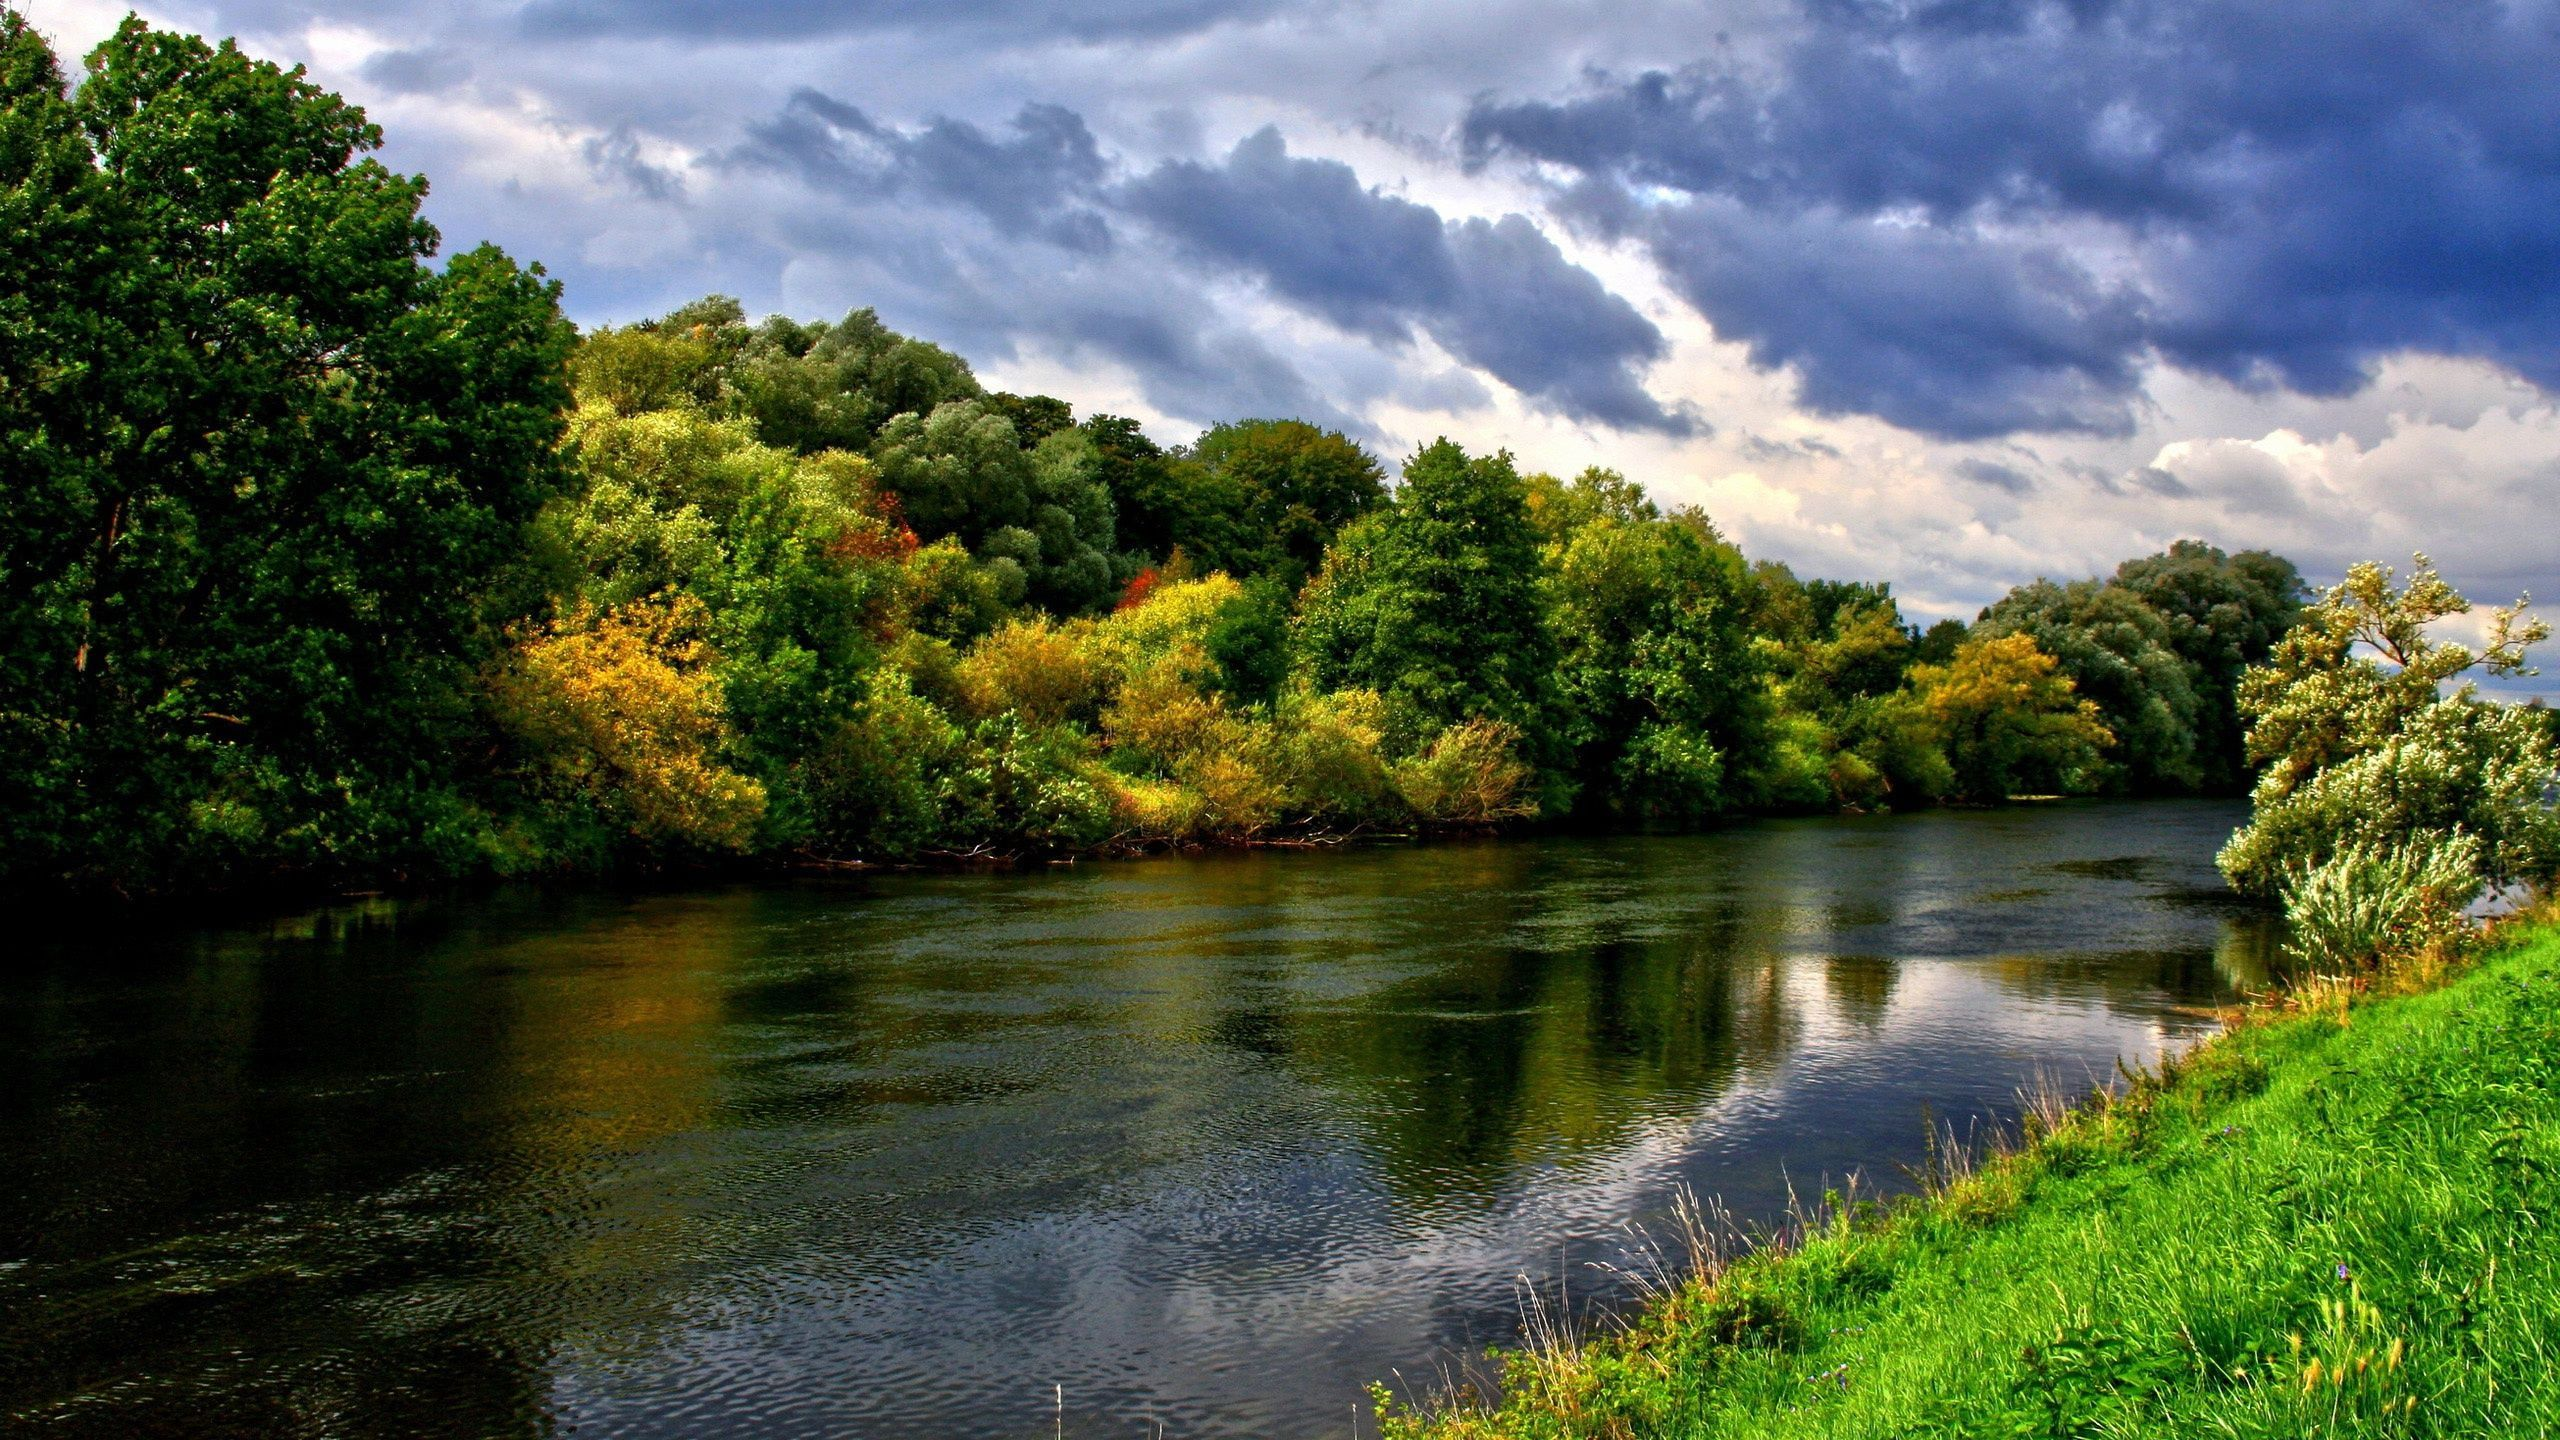 Flowing Forest River Hd Wallpaper Landscape Sunset Wallpaper Iphone 5s Wallpaper